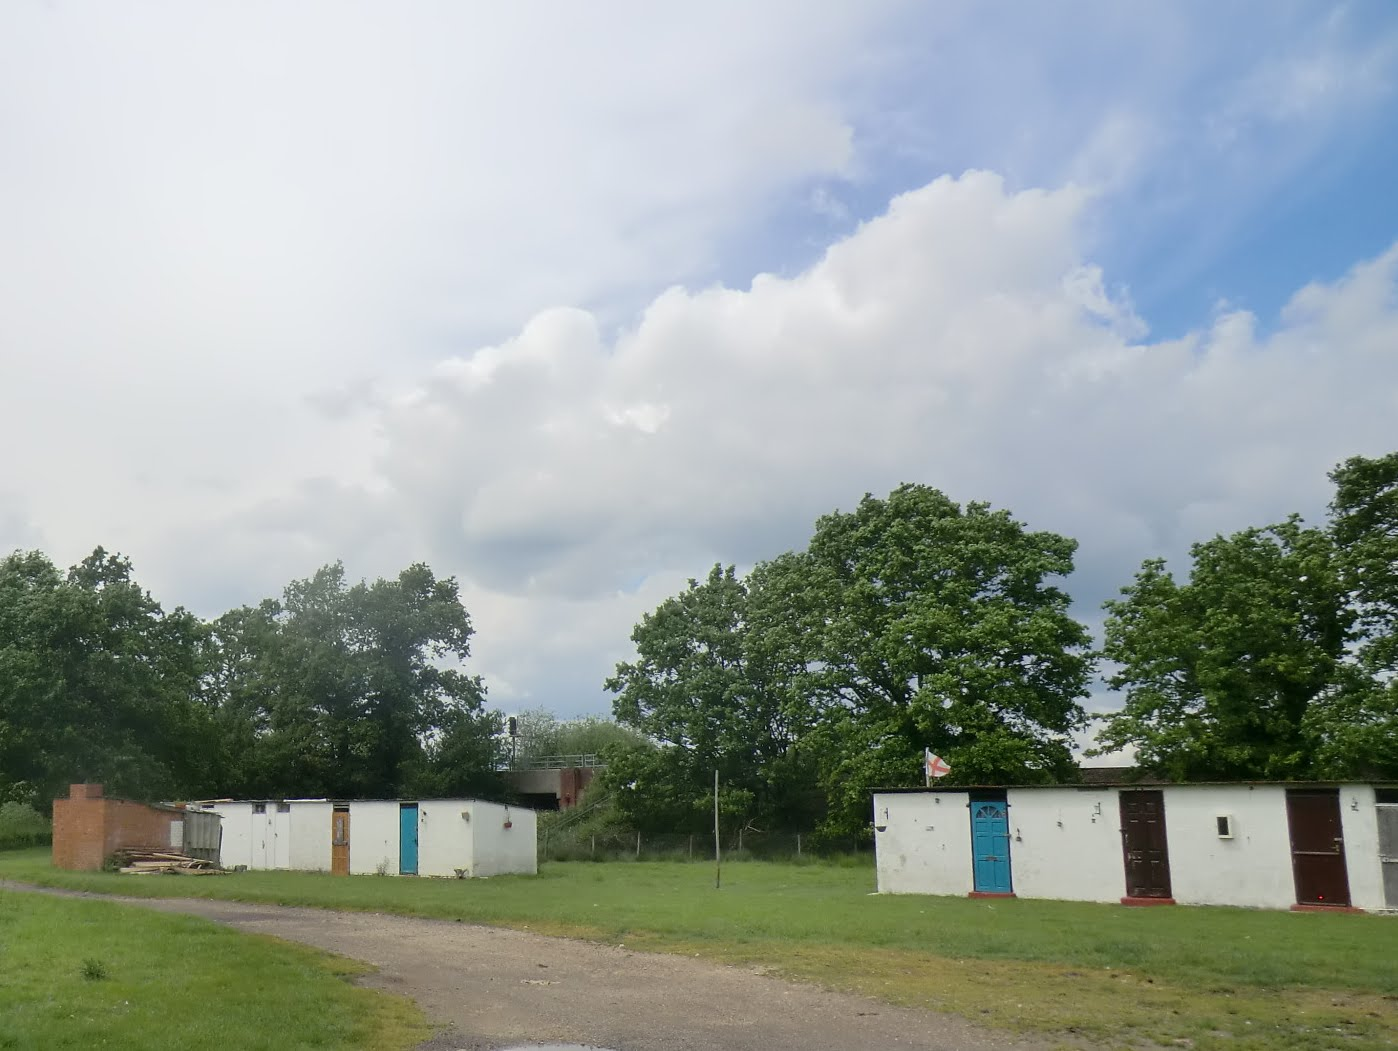 CIMG1643 Hoppers' huts at Finches Farm, Five Oak Green